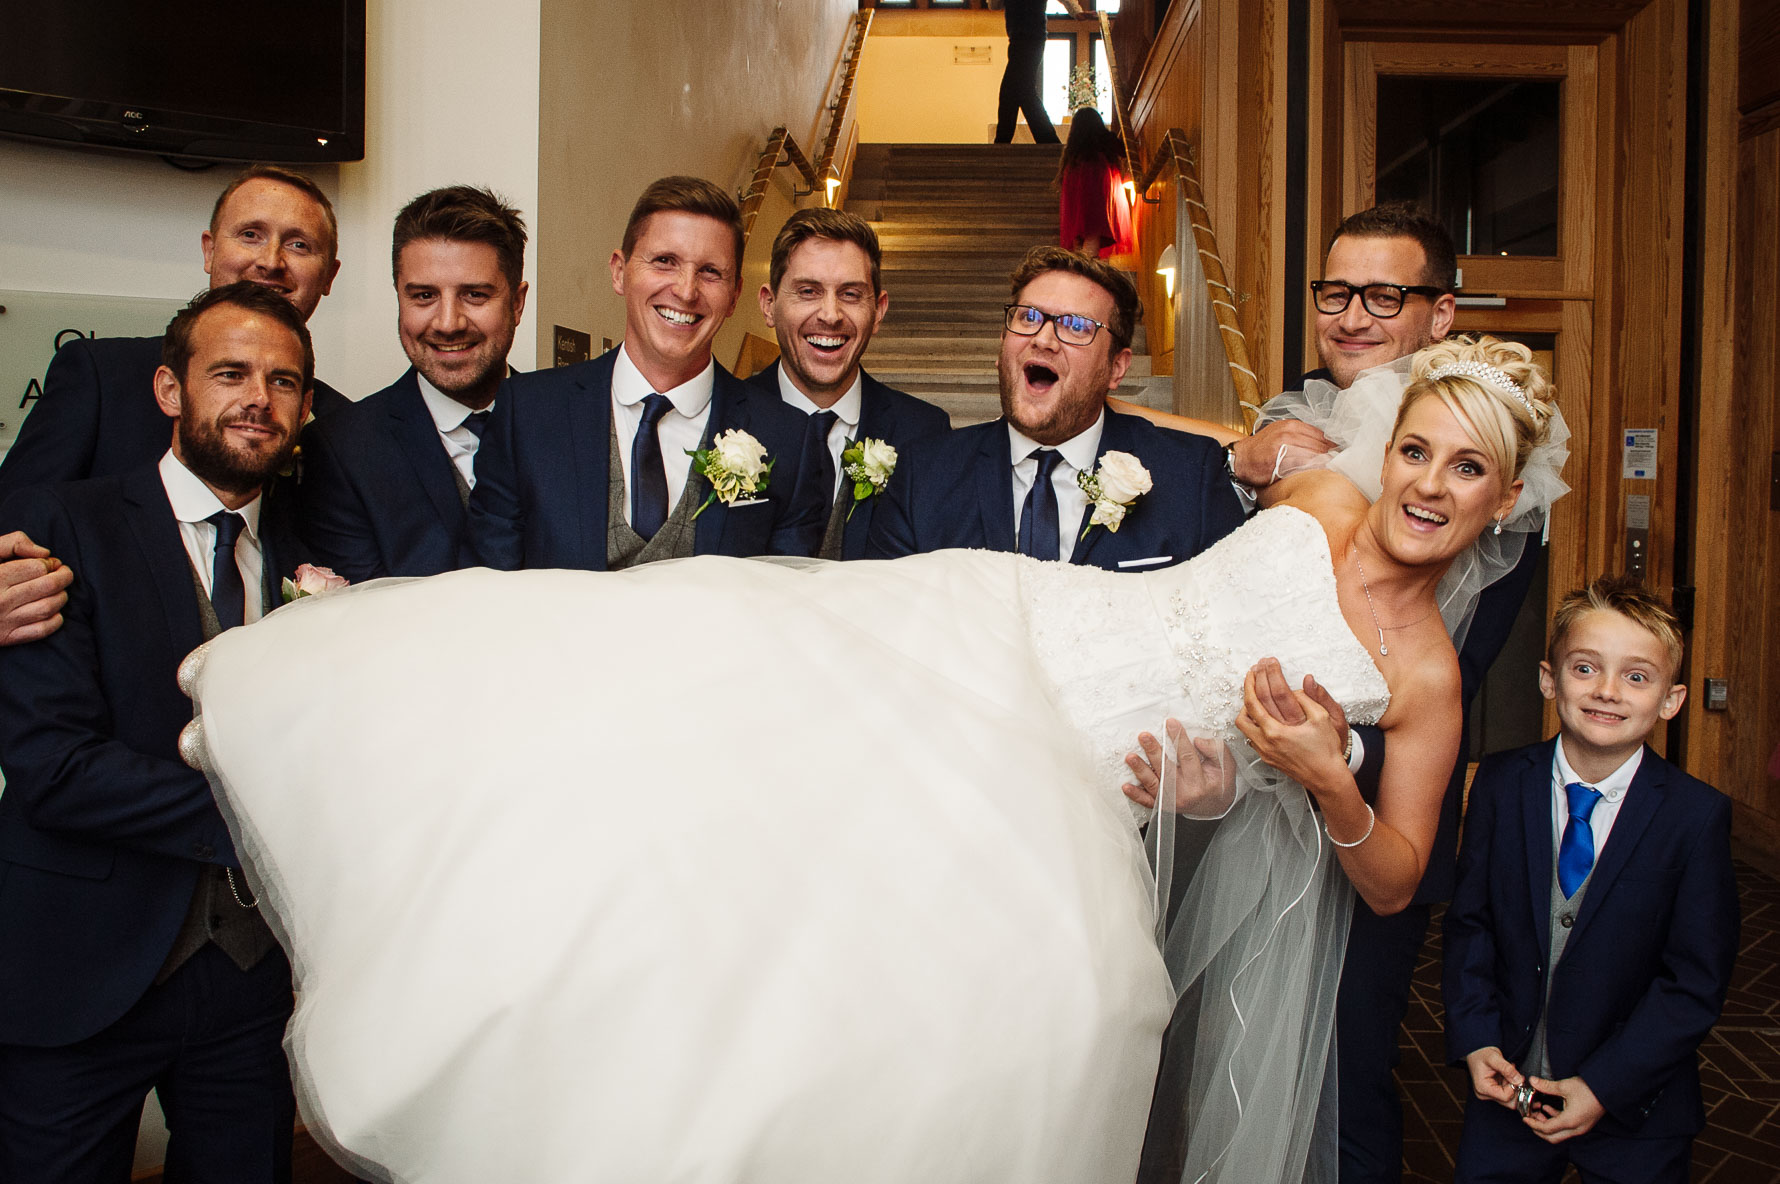 Canterbury Cathedral Lodge Wedding60-20141004 0945